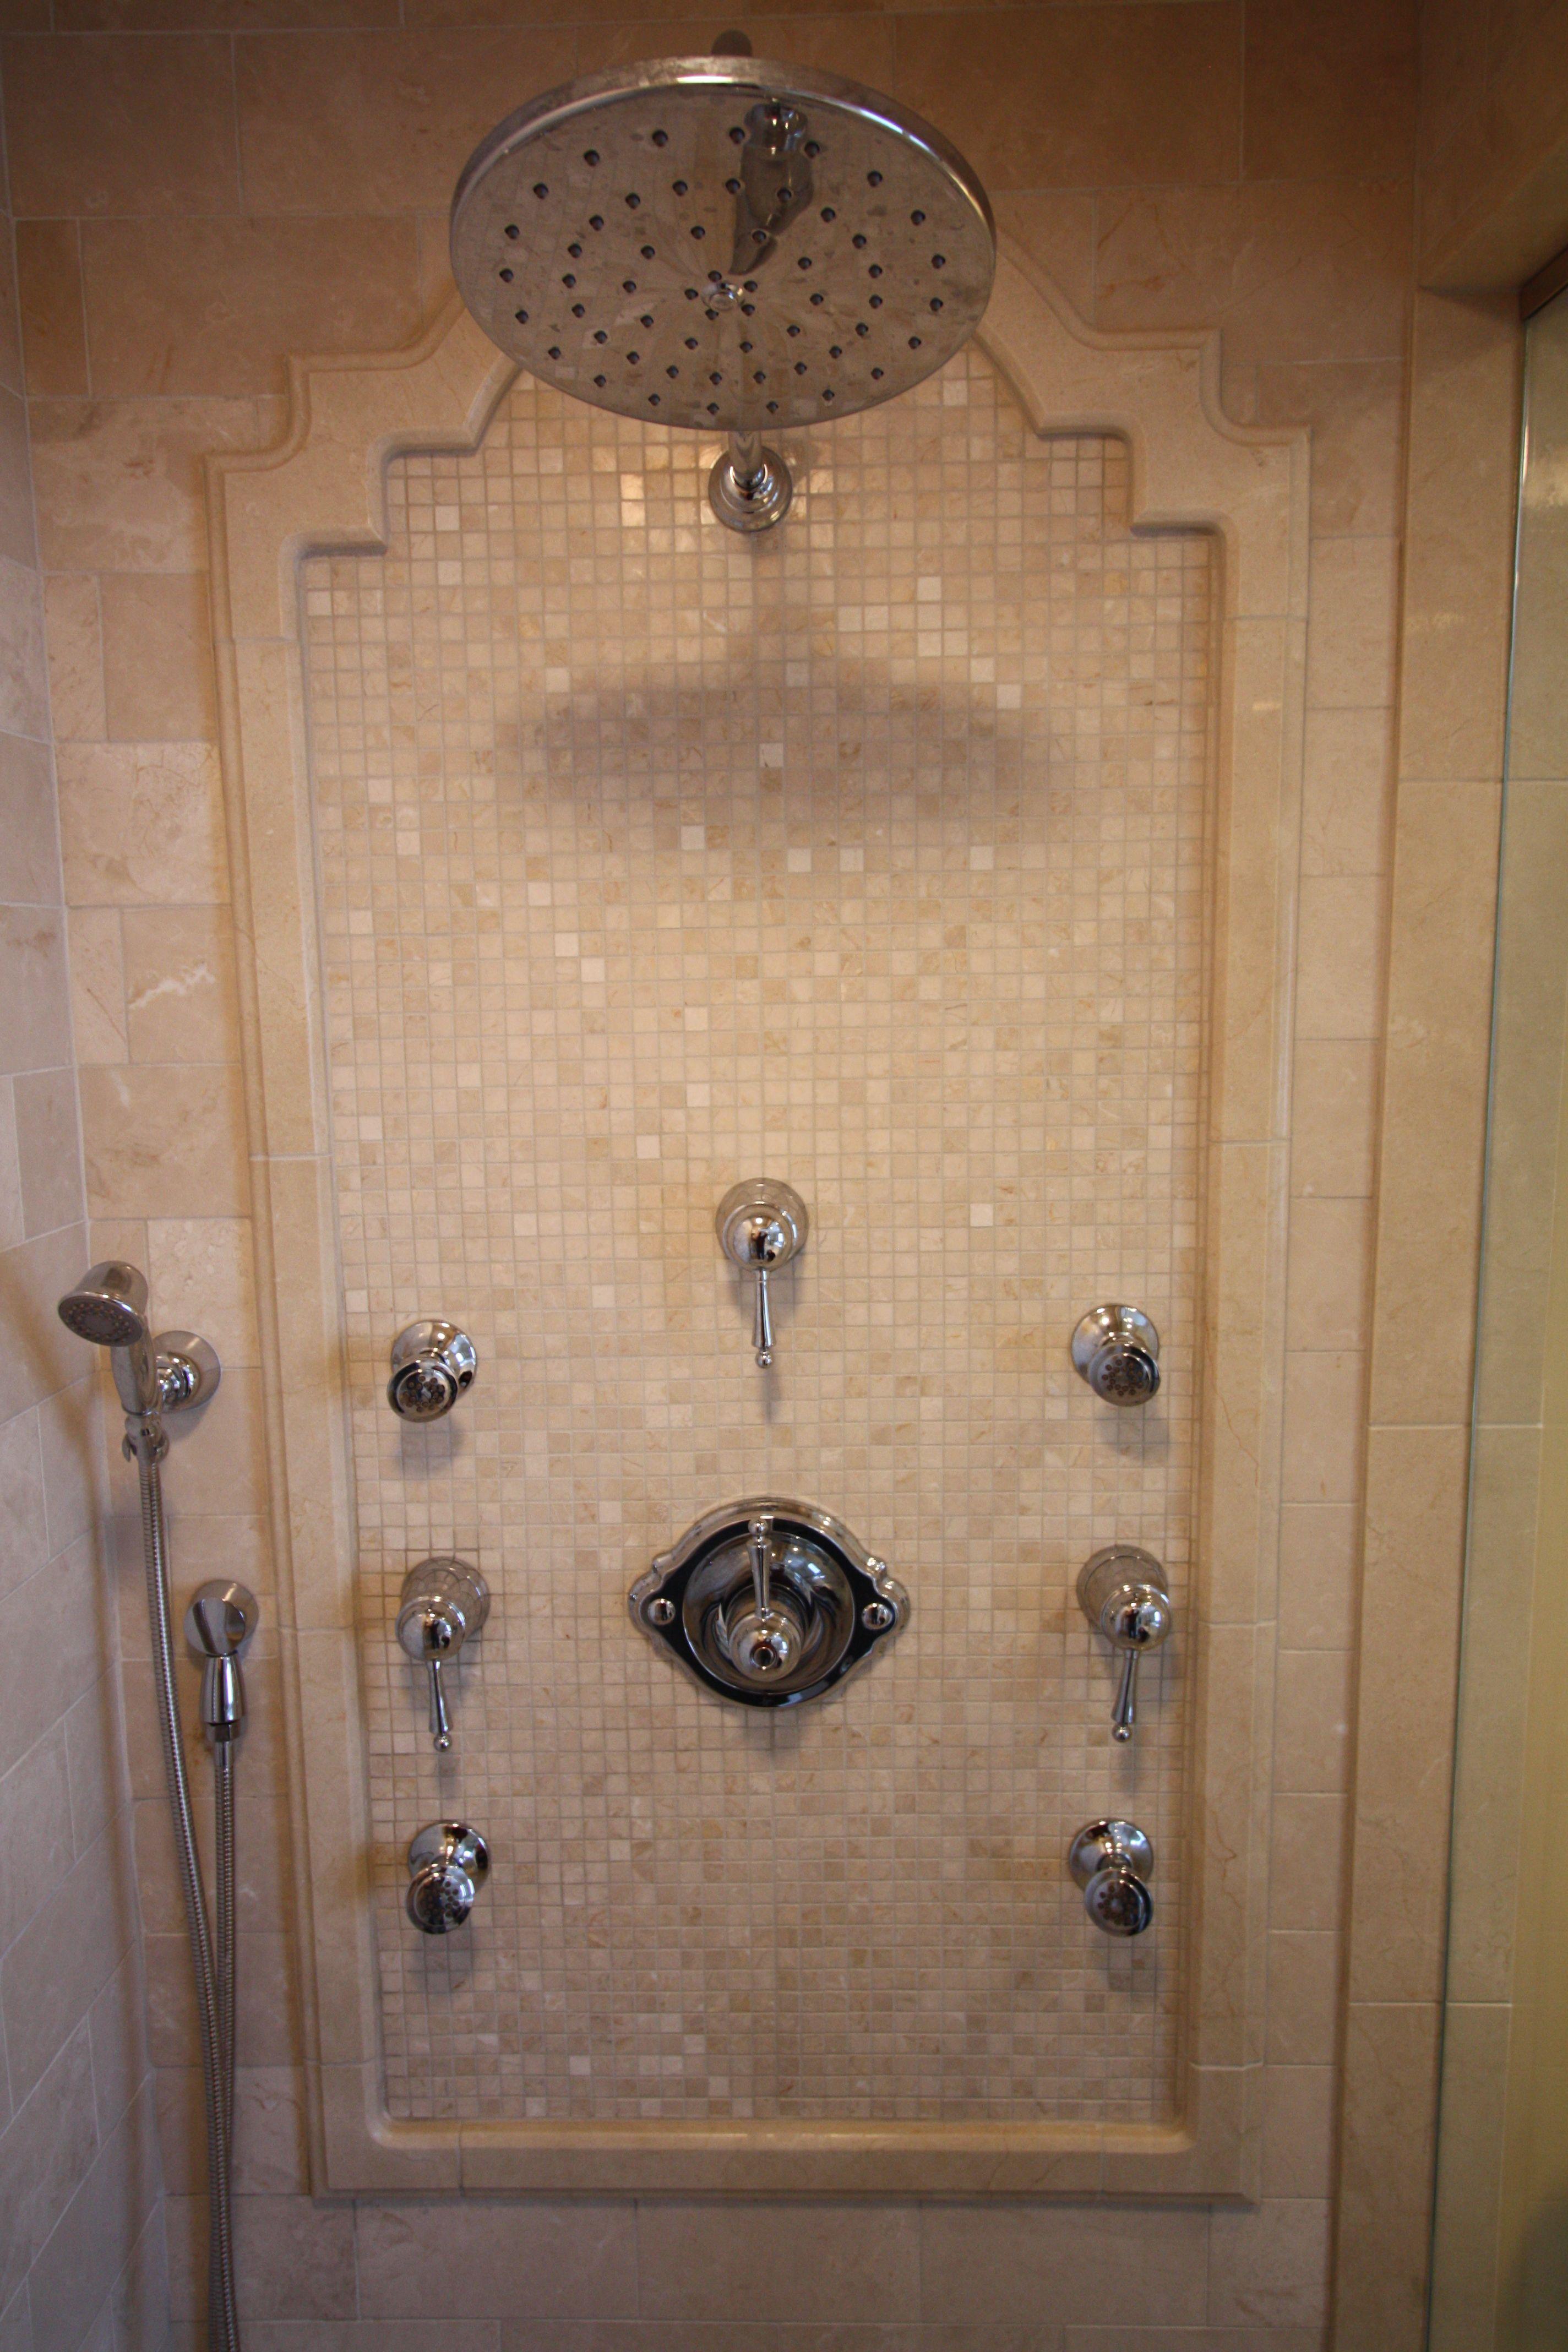 Rain Shower Head With Body Sprays Rain Shower Head Bathroom